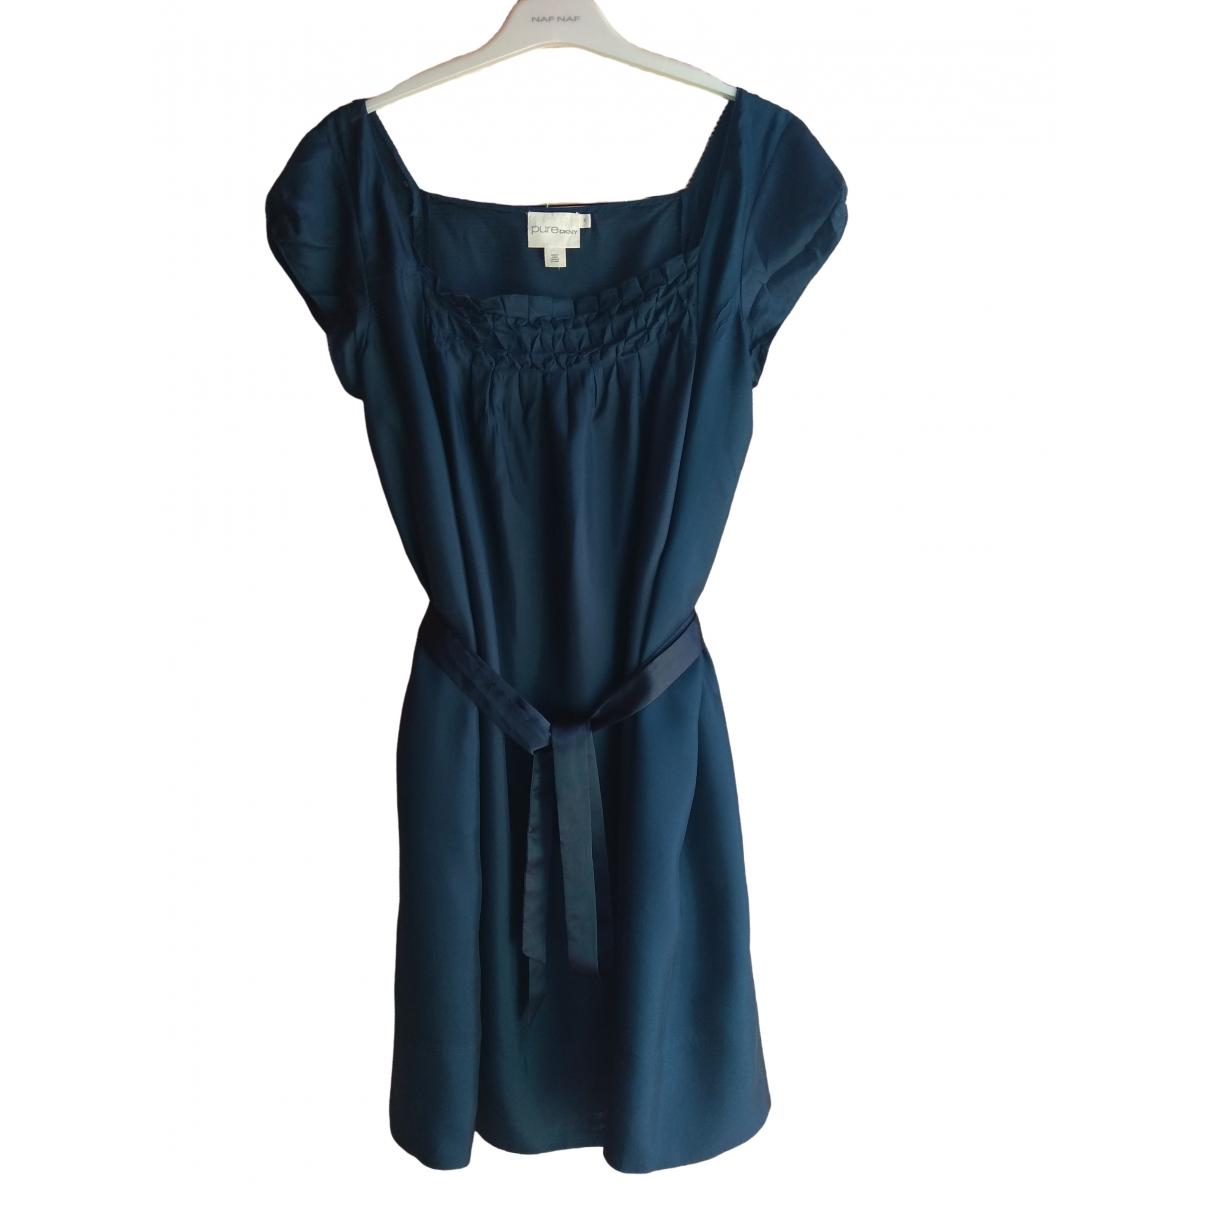 Dkny \N Navy Silk dress for Women M International